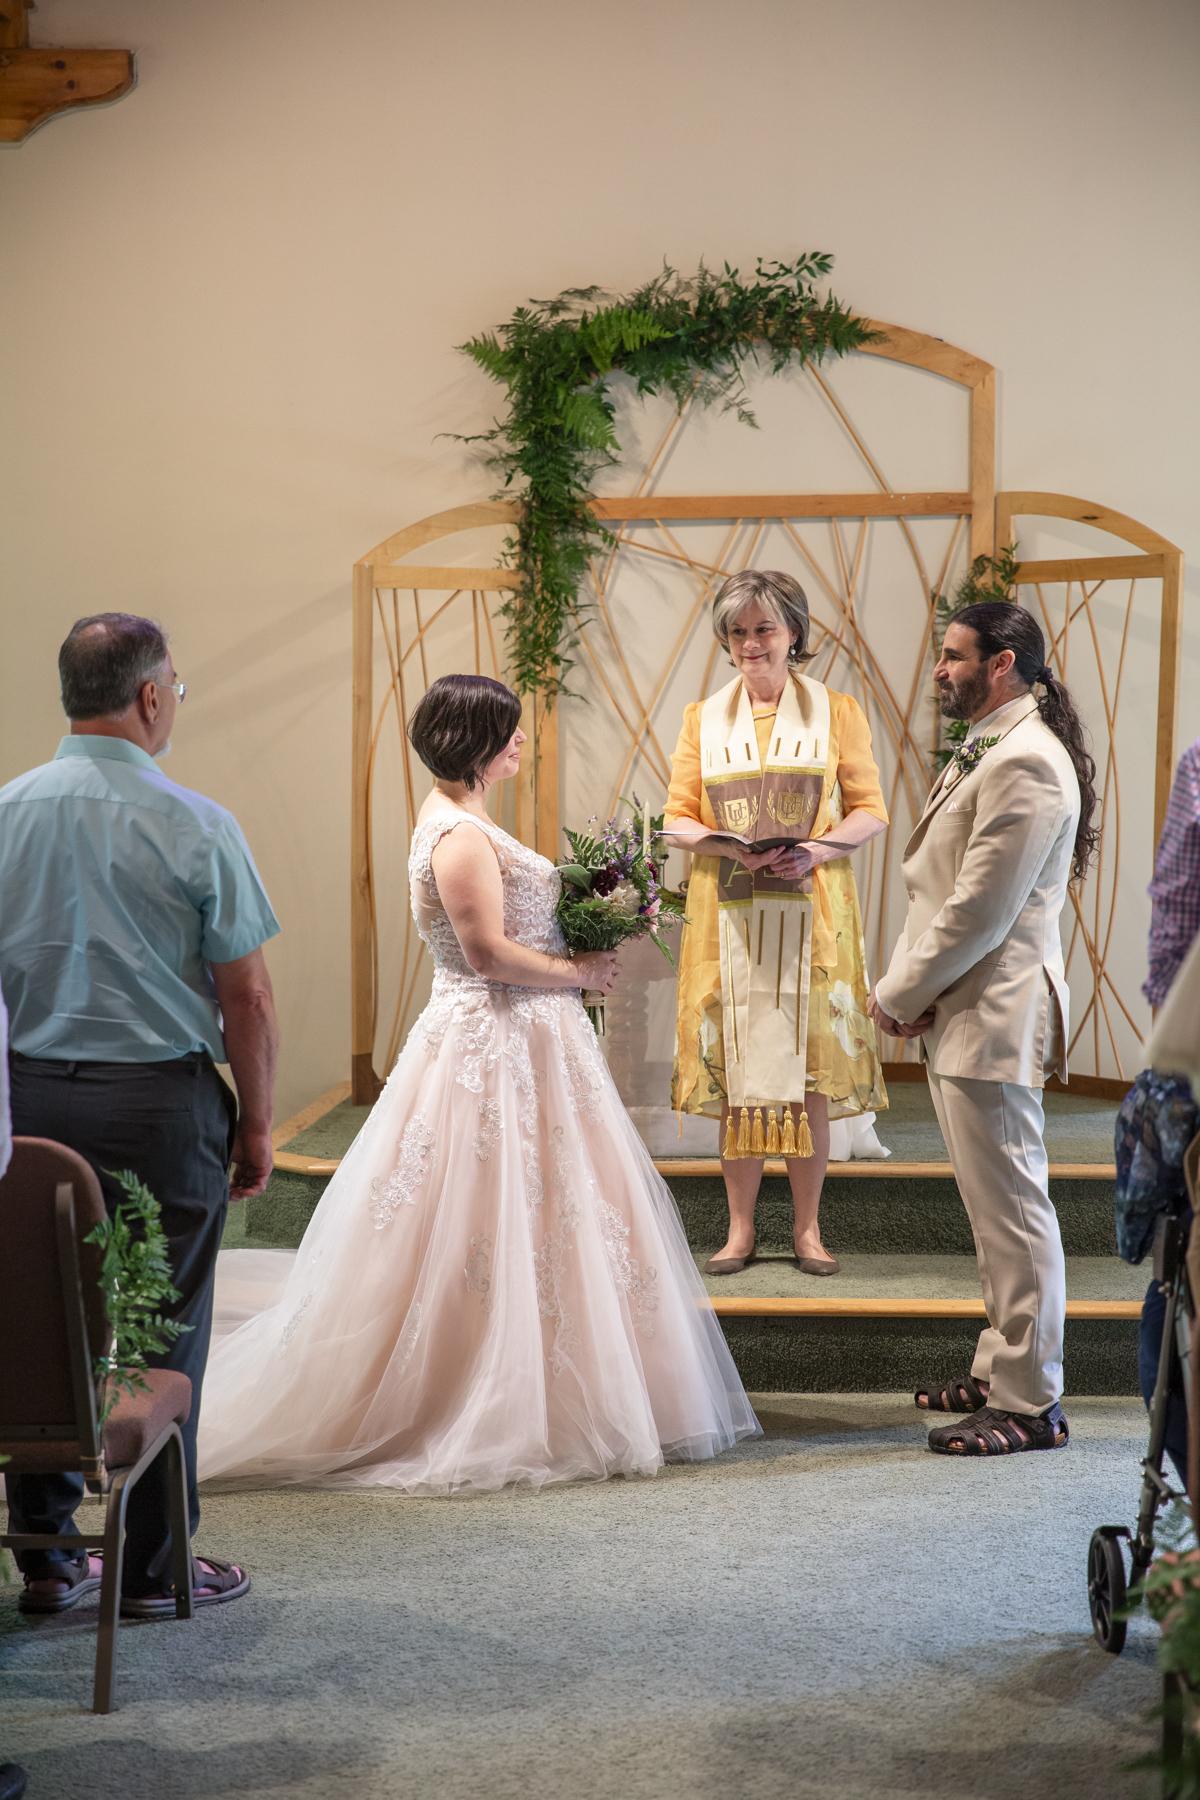 Avyanna and Phoenix Wedding- Photos by Studio Misha_BLOG-69.jpg